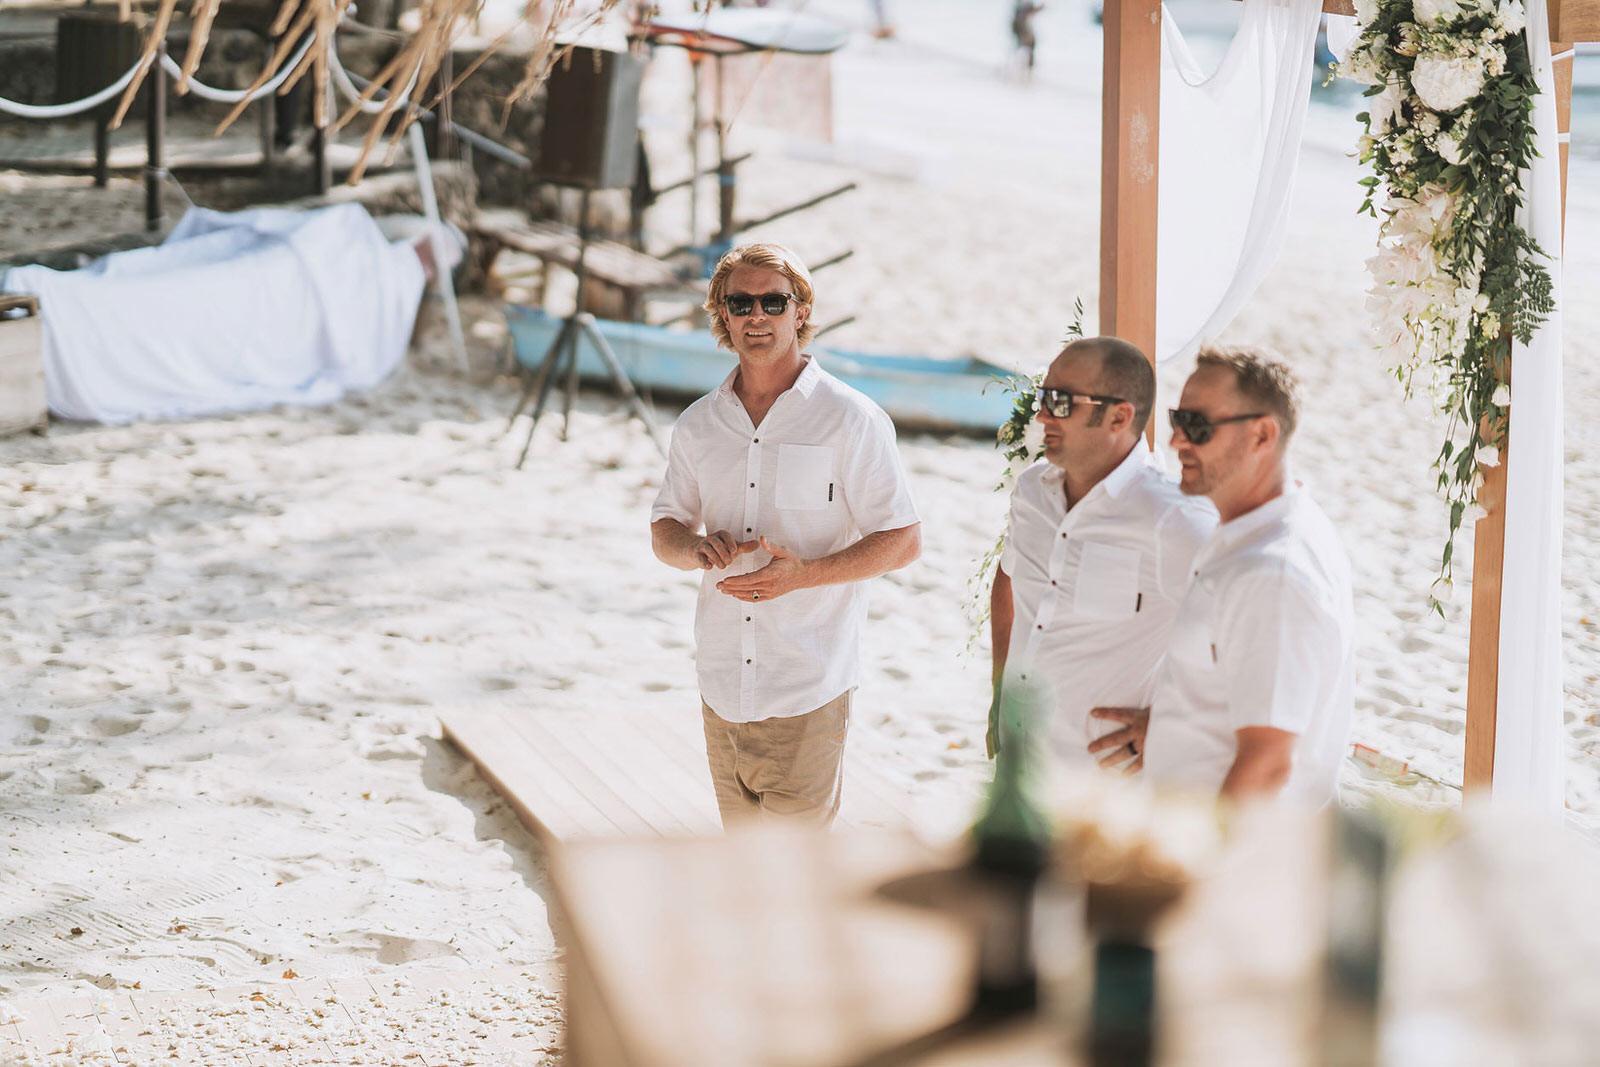 newfound-hai-tide-nusa-lembongan-bali-wedding-photographers-105